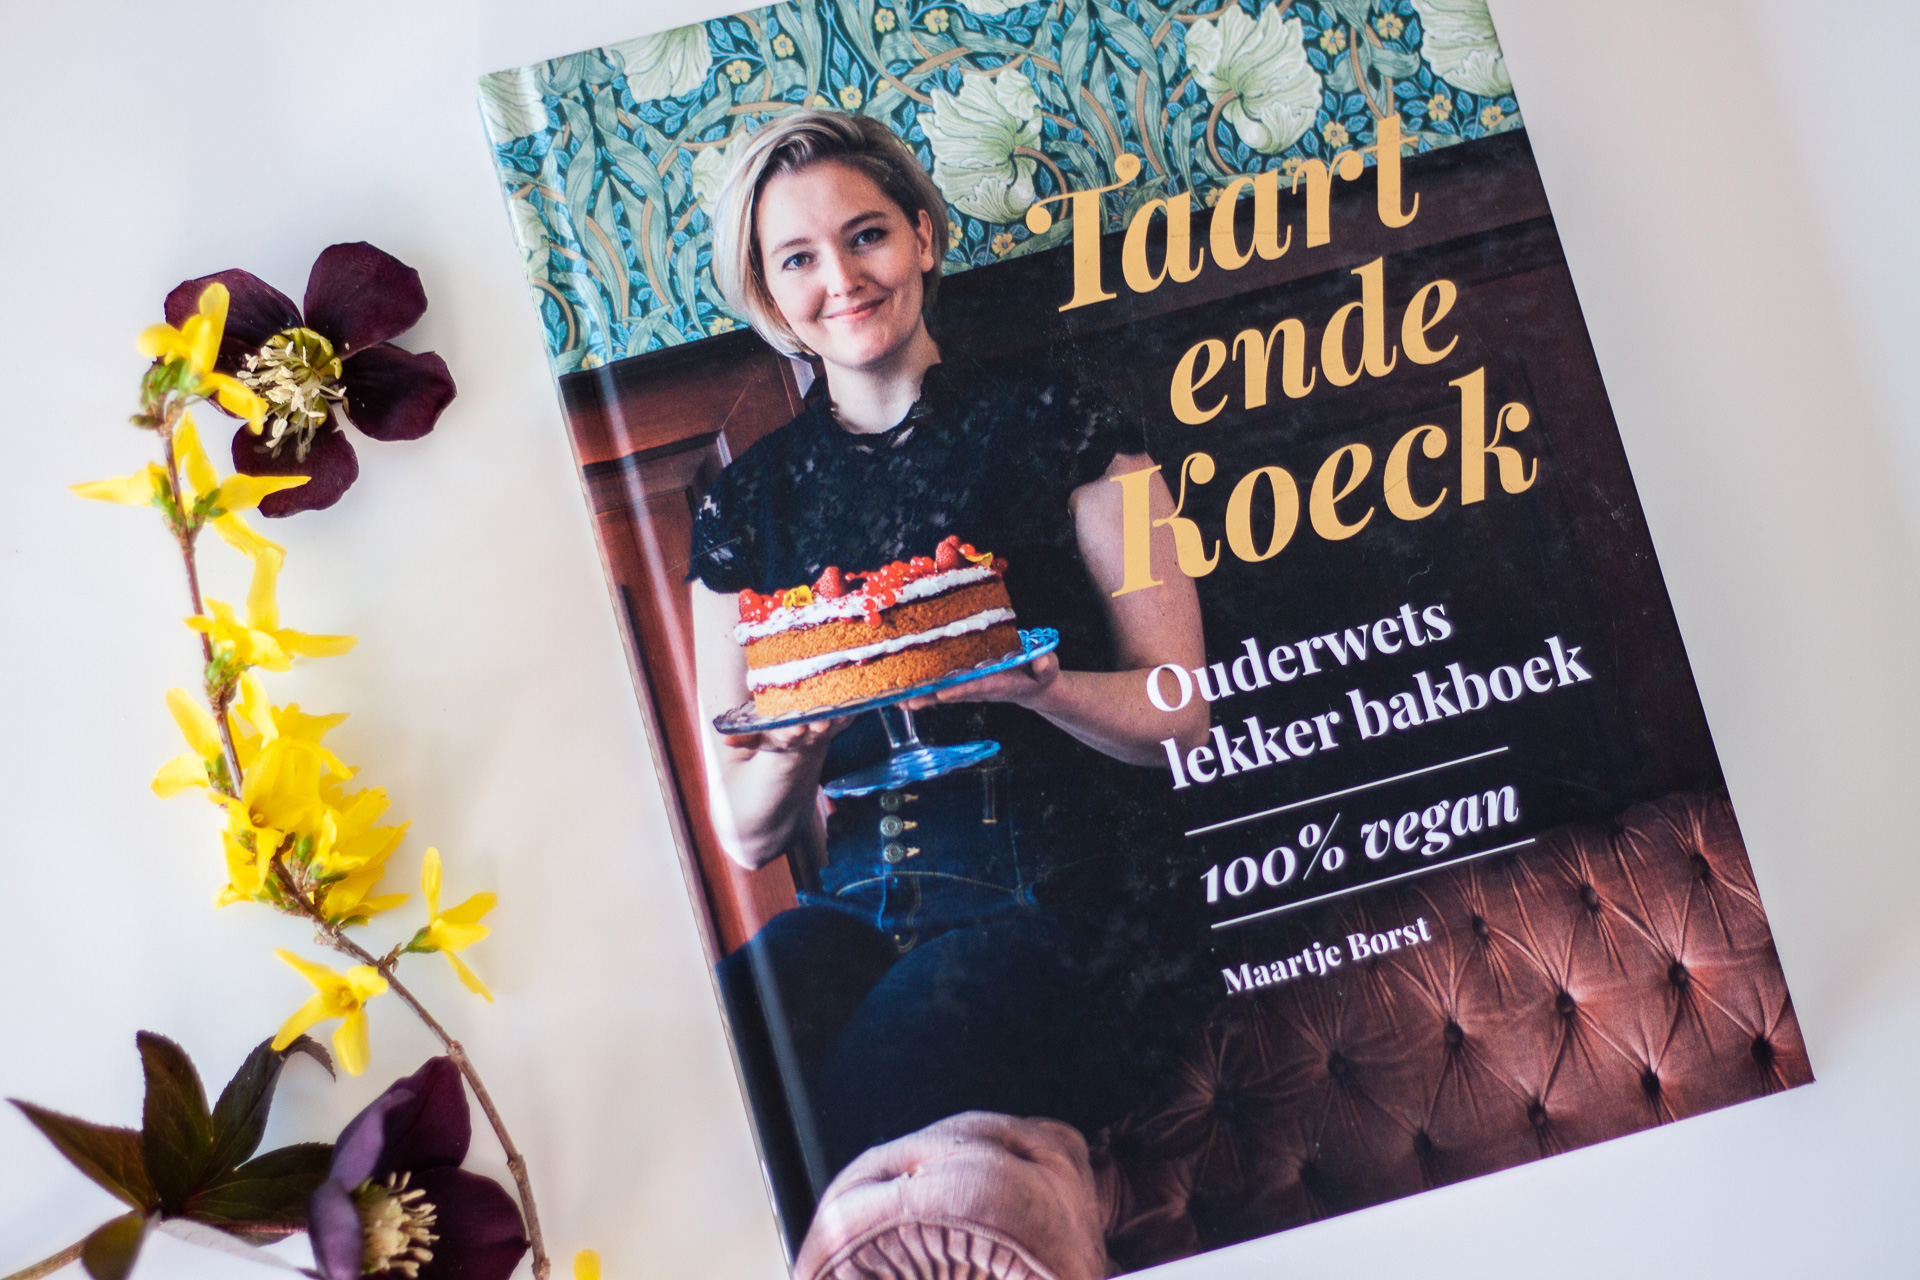 Taart ende Koeck – Maartje Borst